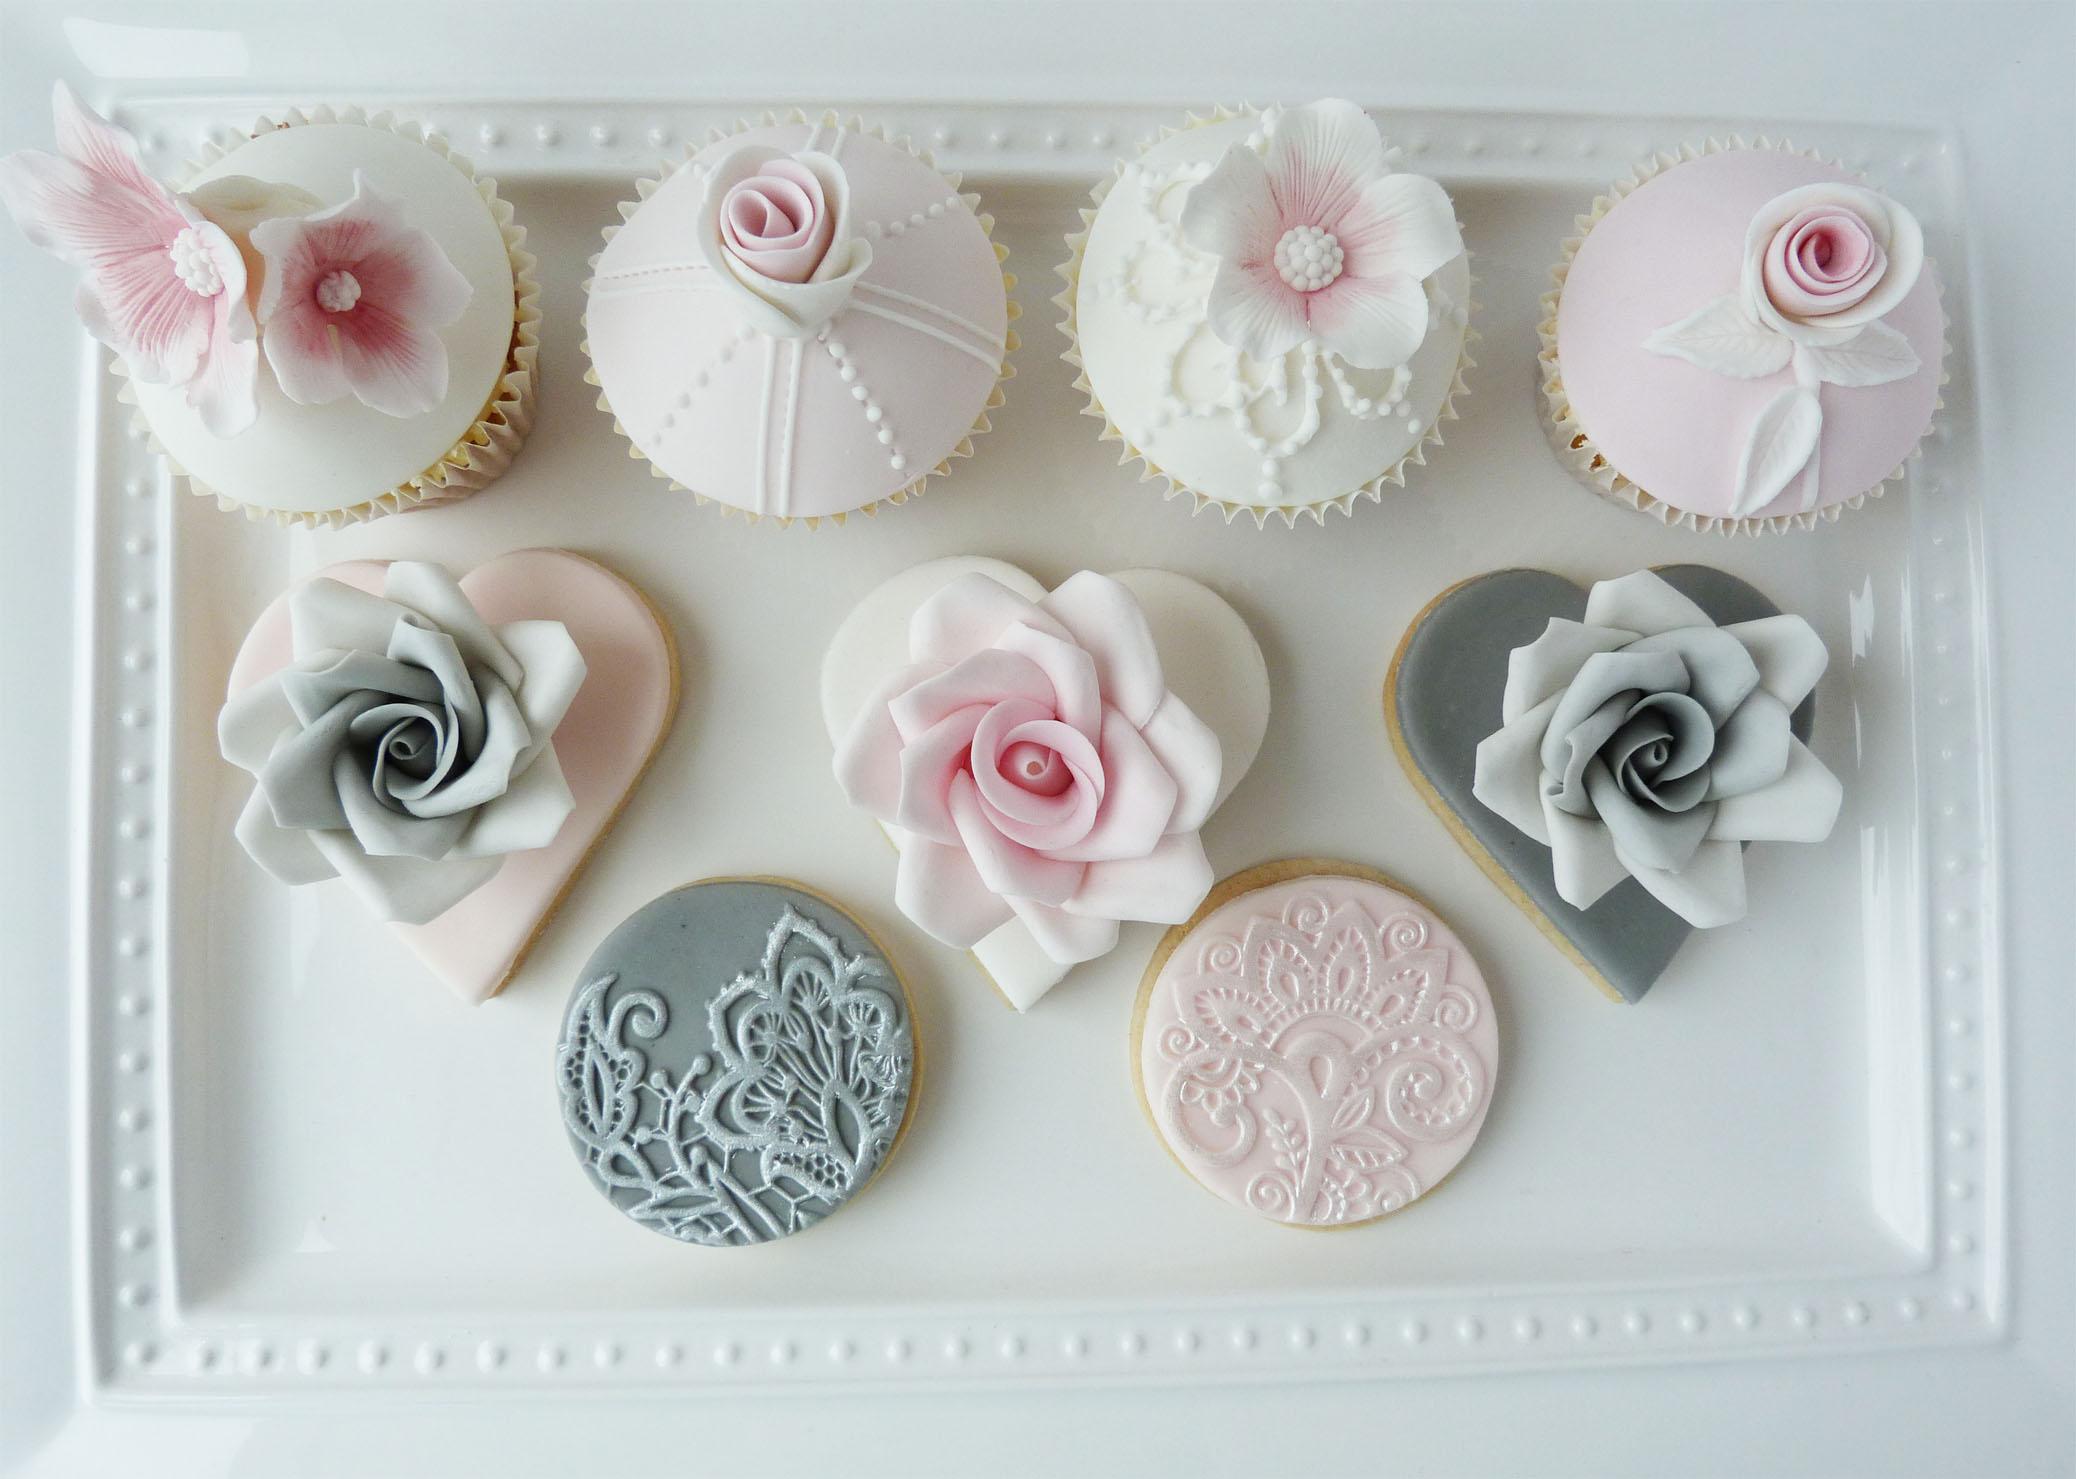 Vintage lace cupcakes and cookies.jpg